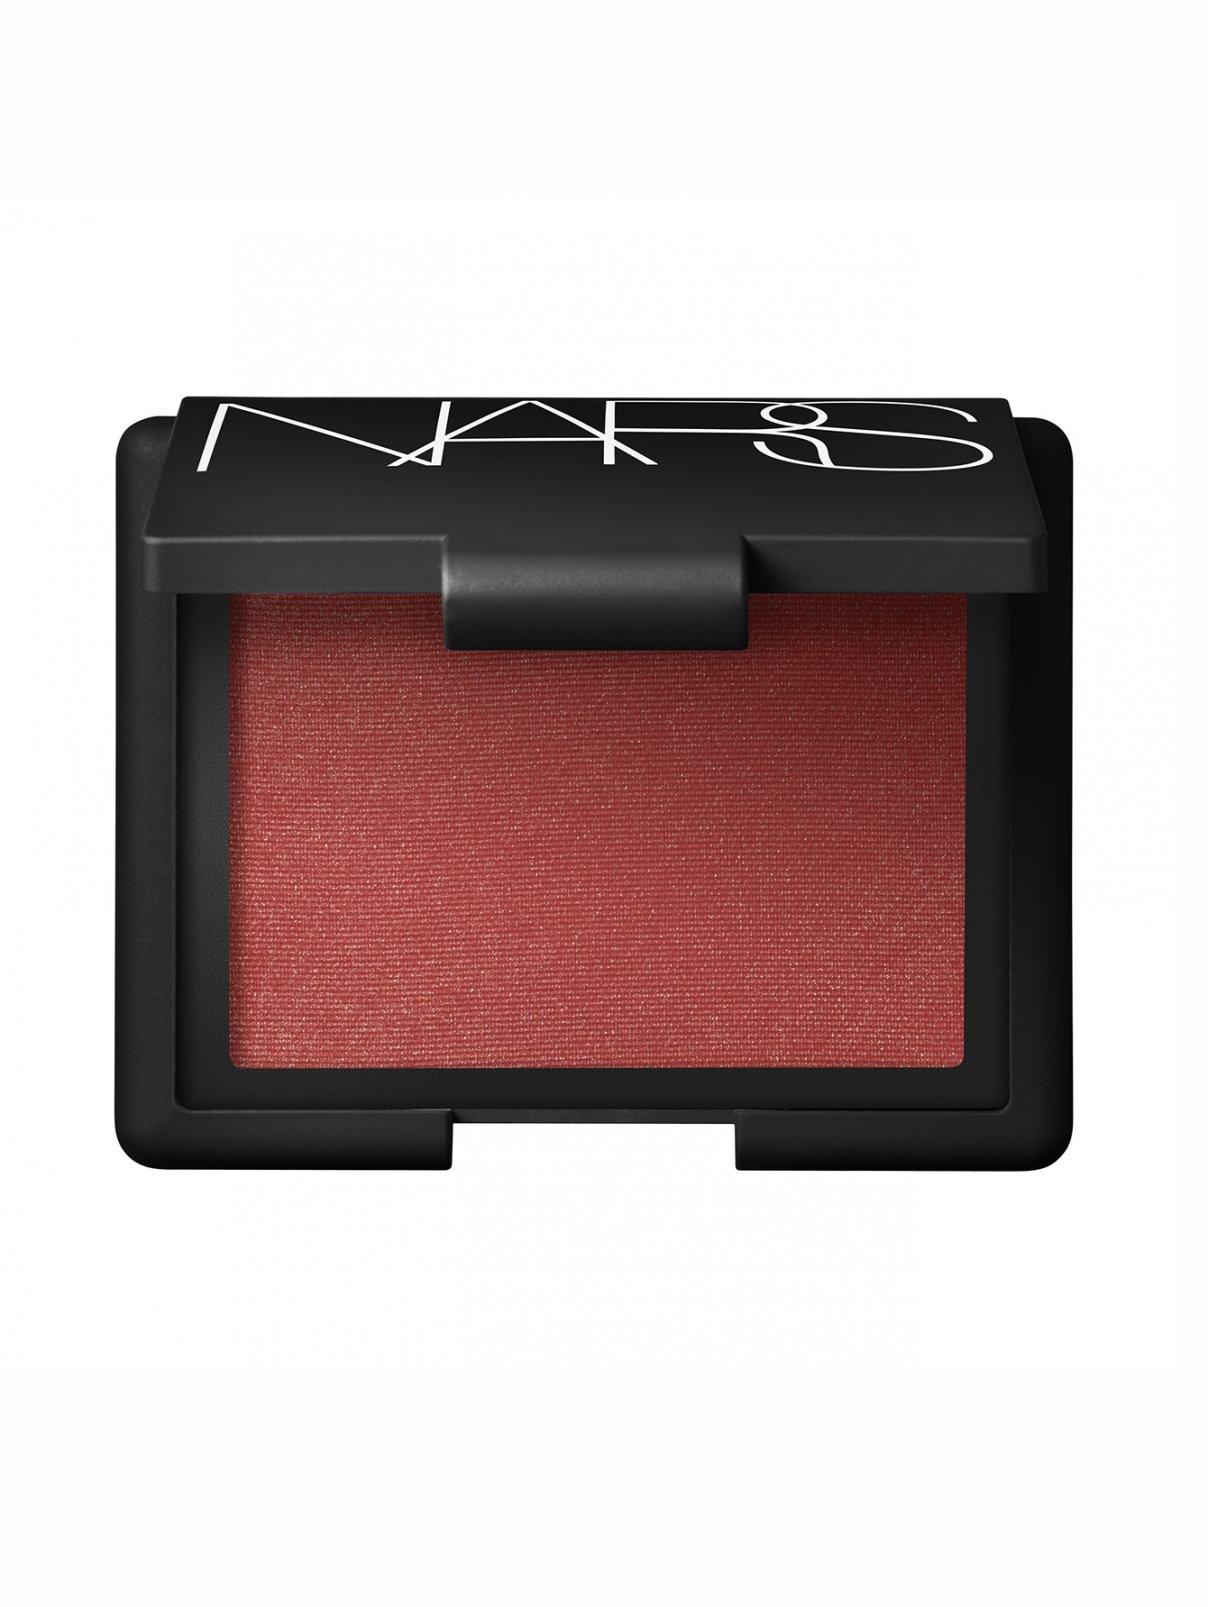 Румяна TAOS Makeup NARS  –  Общий вид